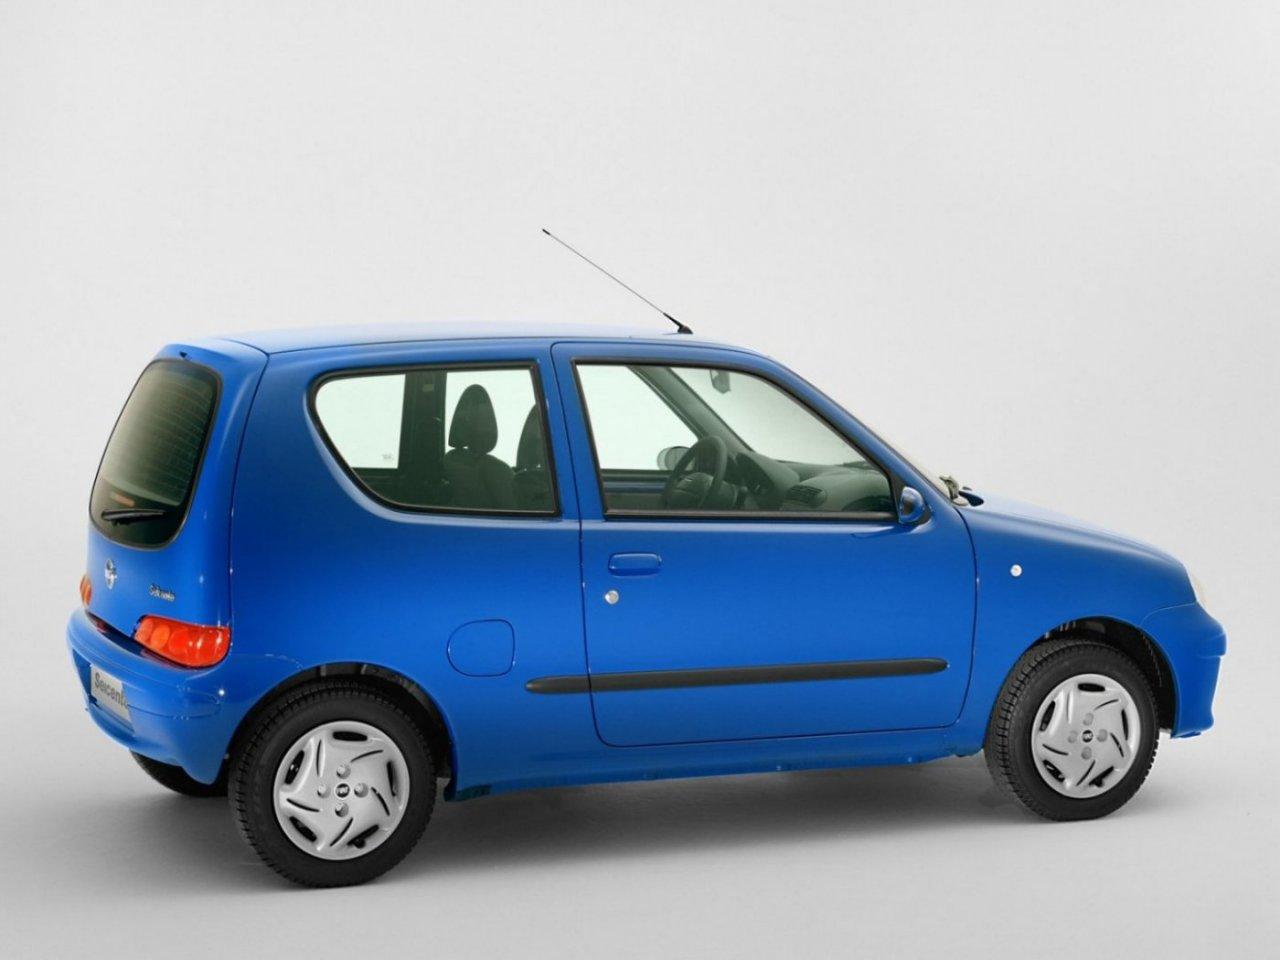 Fiat Seicento Fiat Seicento 187 Fiat